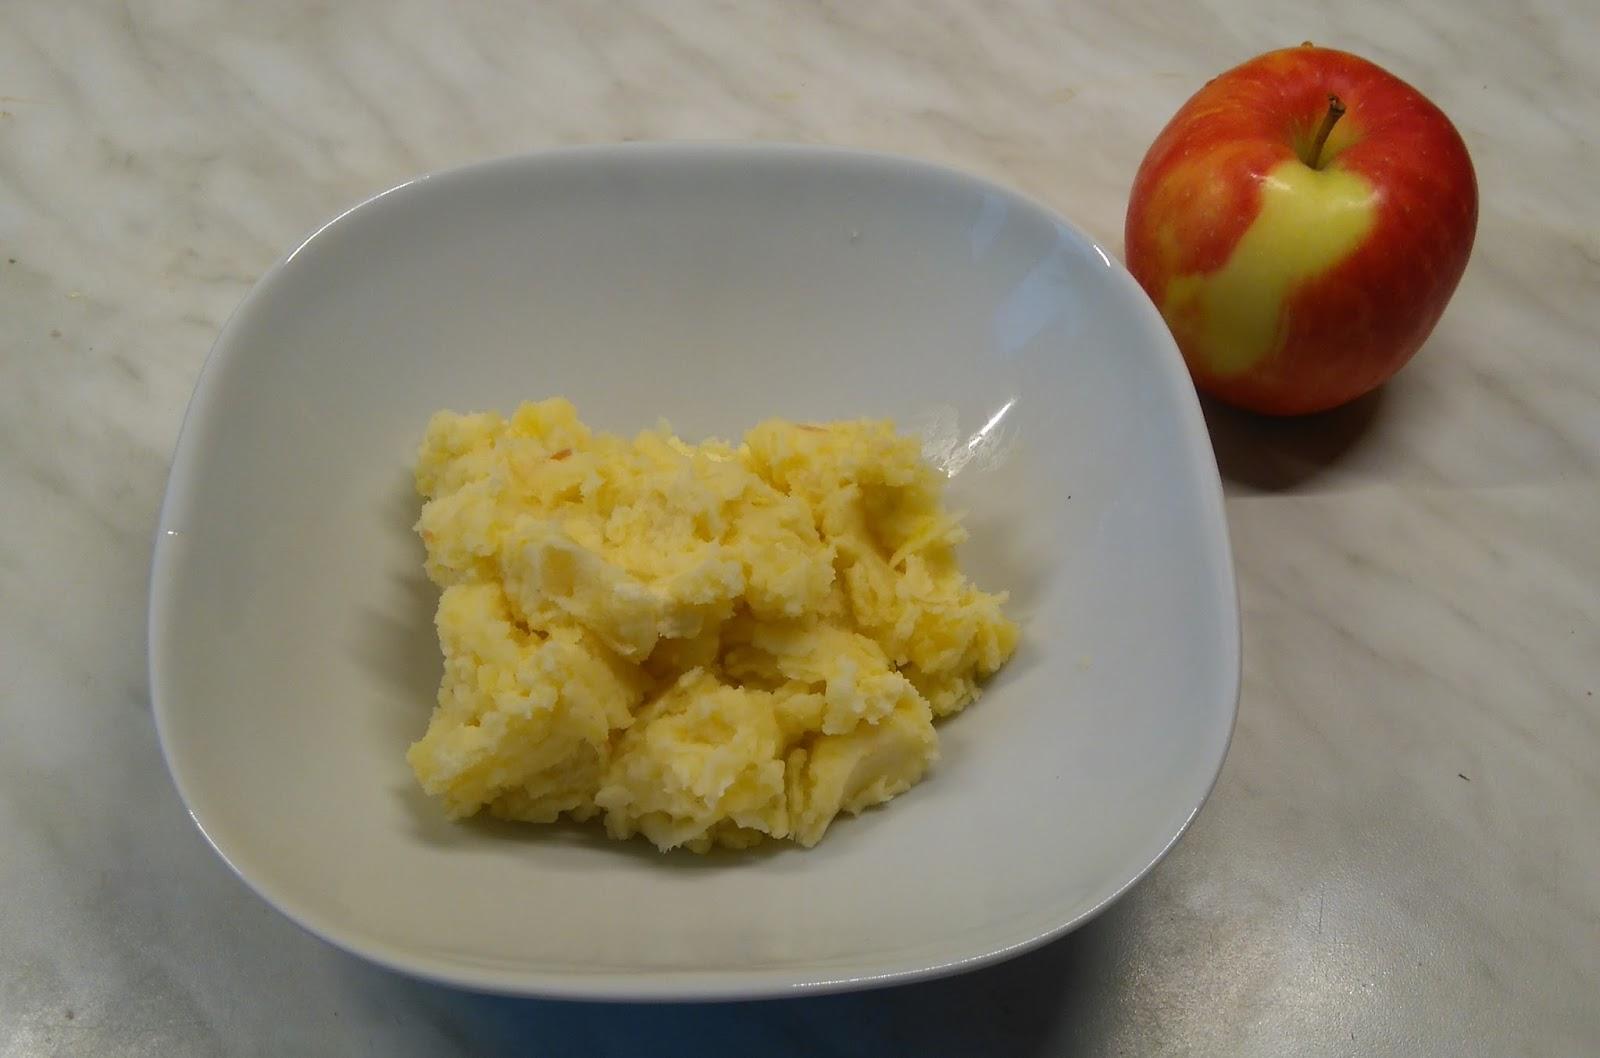 Kartoffelpüree mal anders, vegan, vegetarisch, mit Käse, Erdnussbutter, öl, Essig, Gemüse, Apfel